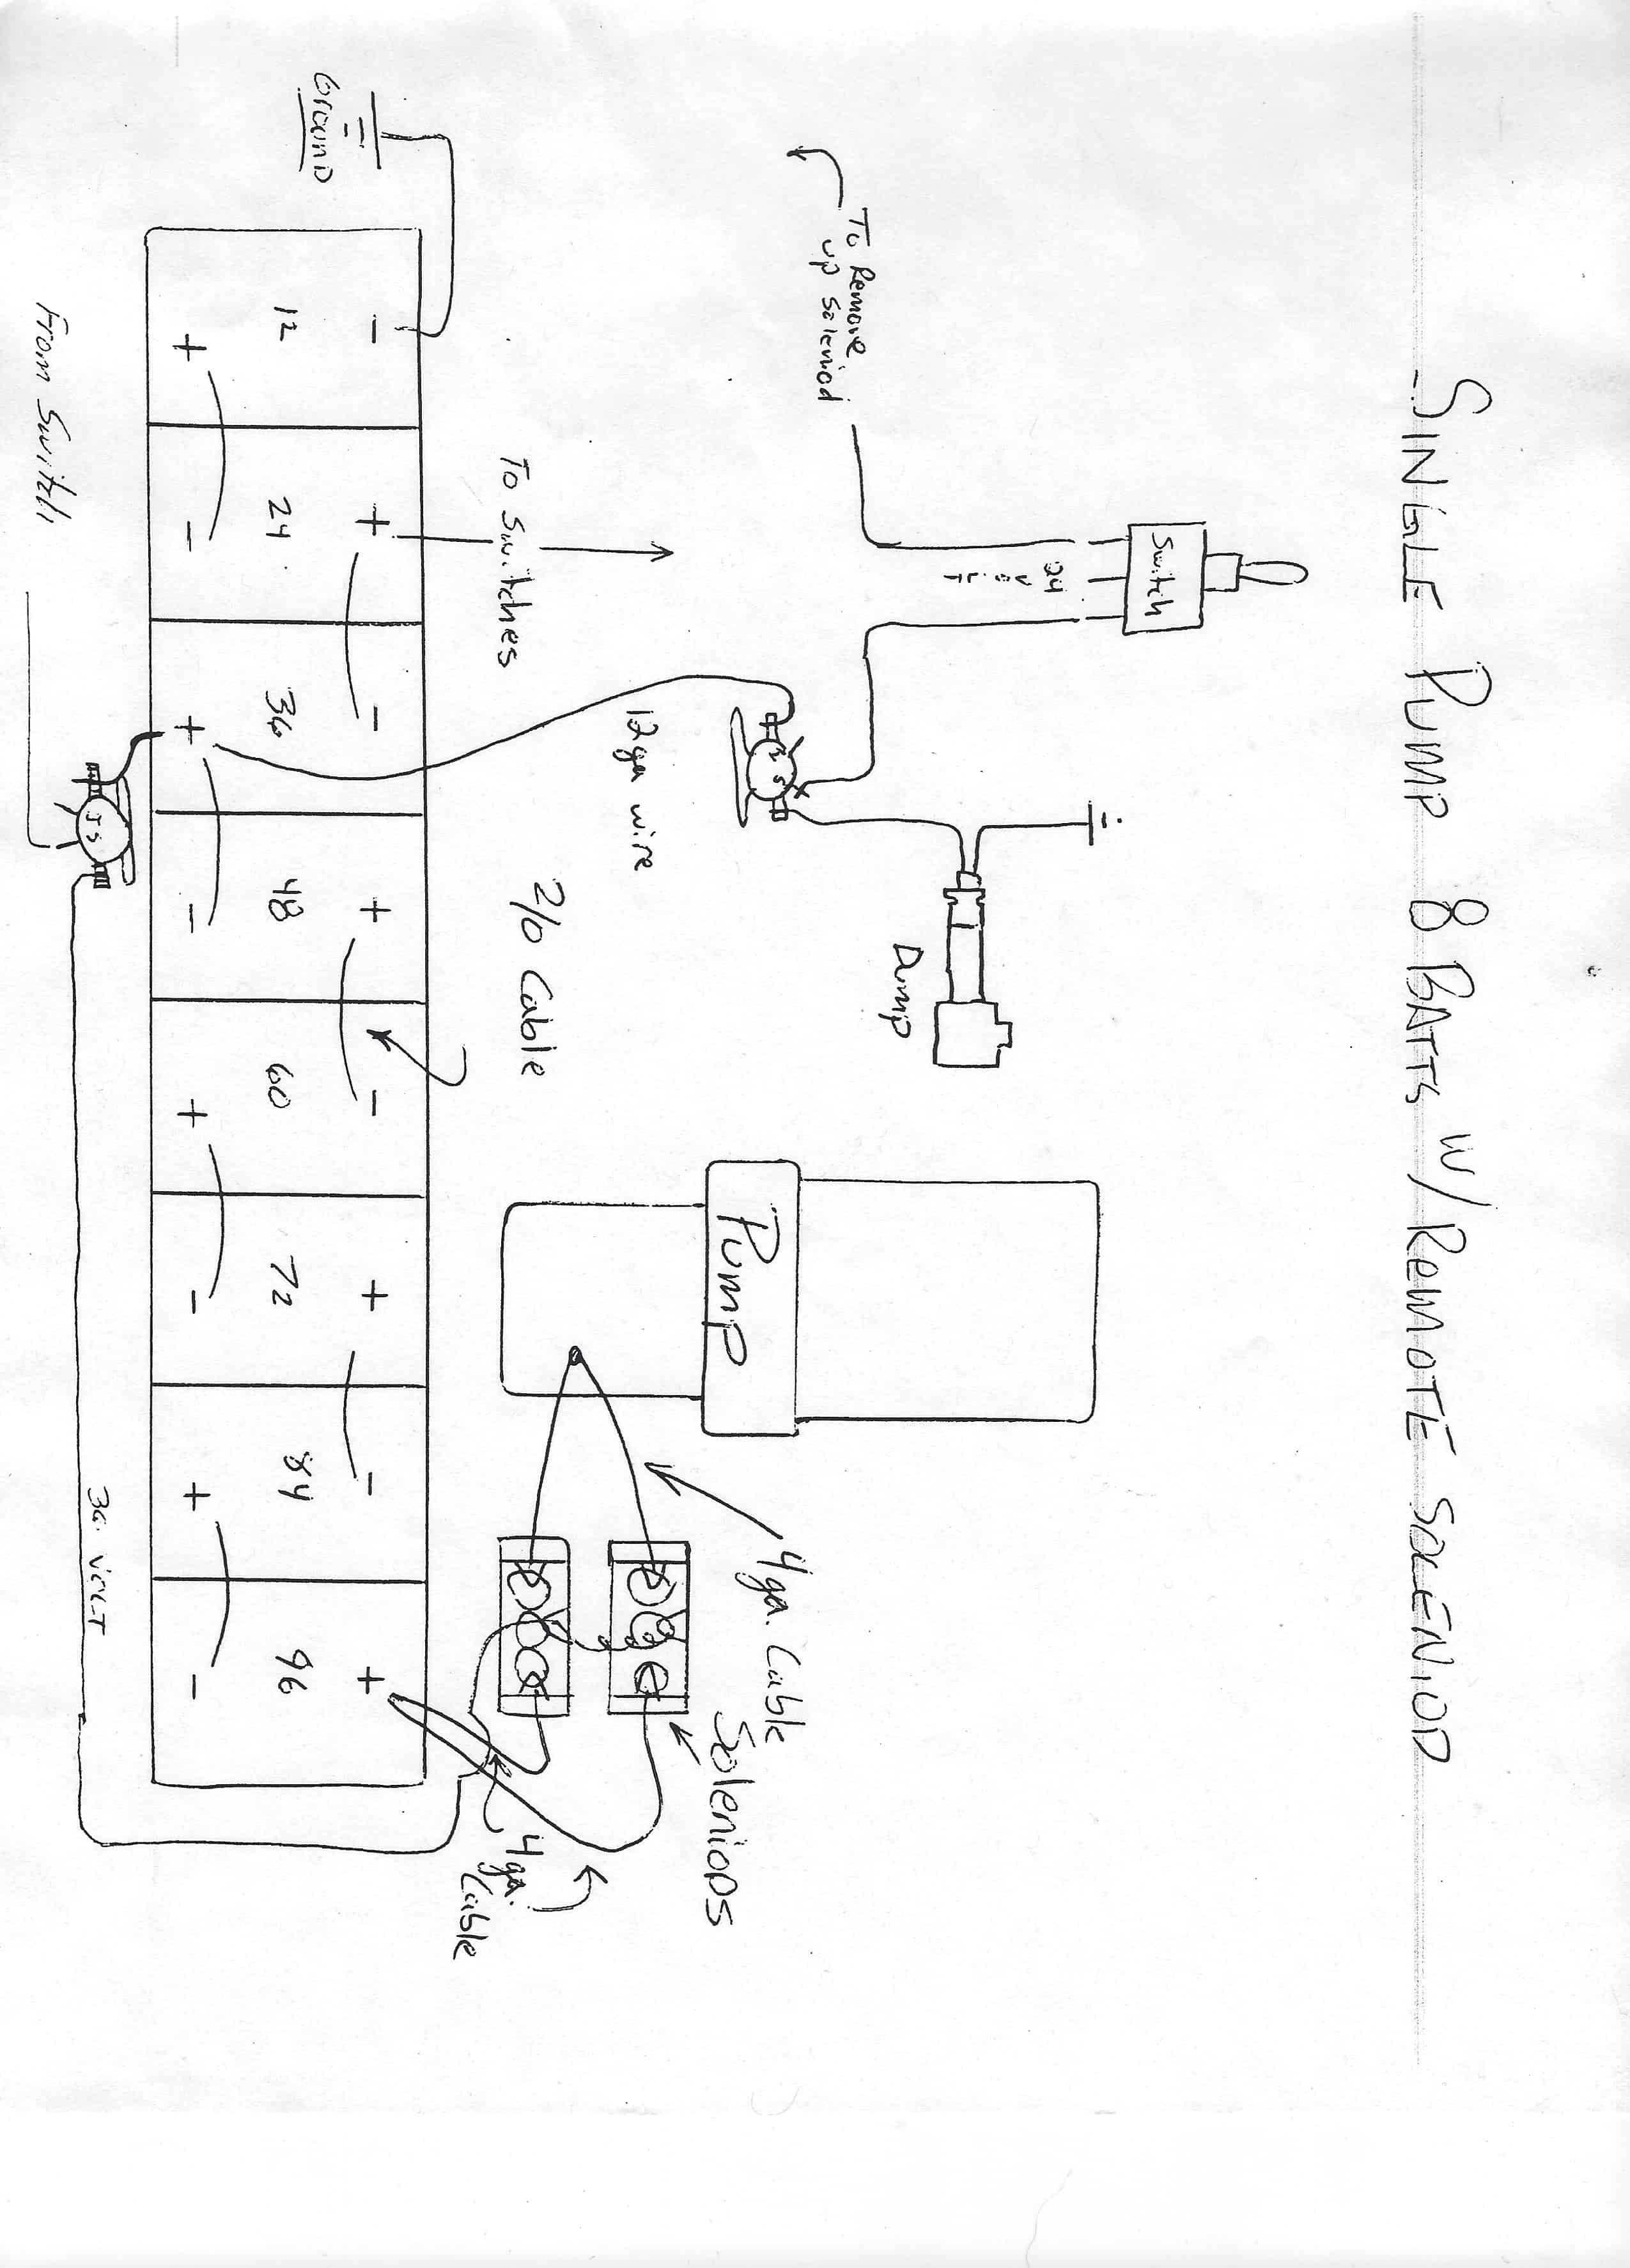 Frequently Asked Questions - Black Magic Hydraulics | Hydraulics Switch Box Wiring Diagram 10 |  | Black Magic Hydraulics